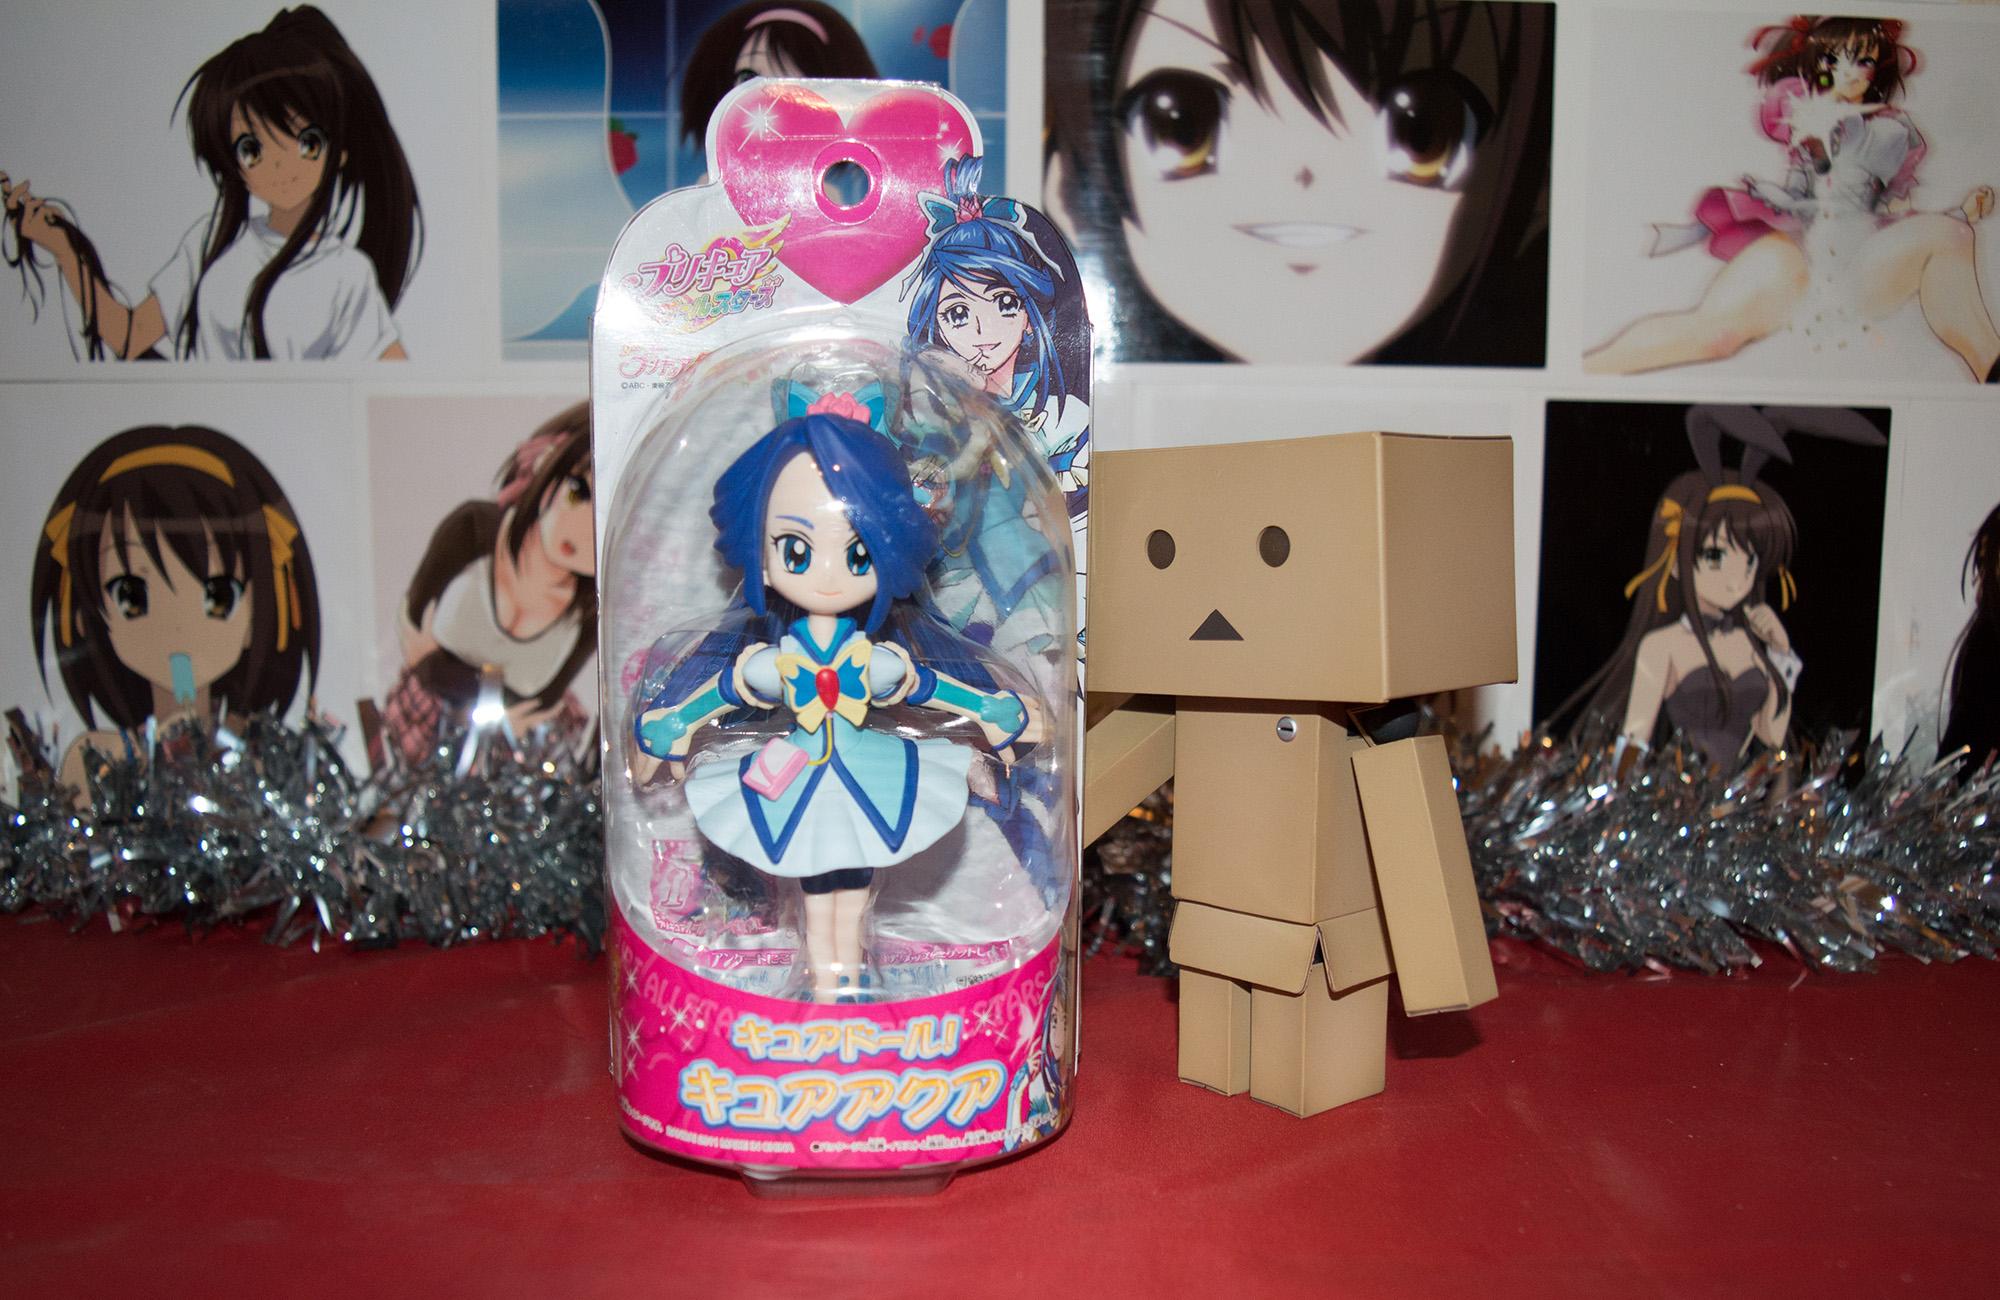 JList Fuku-Bukuro Lucky Anime Toy Set Overview haruhichan.com Dokidoki! Precure - Figure